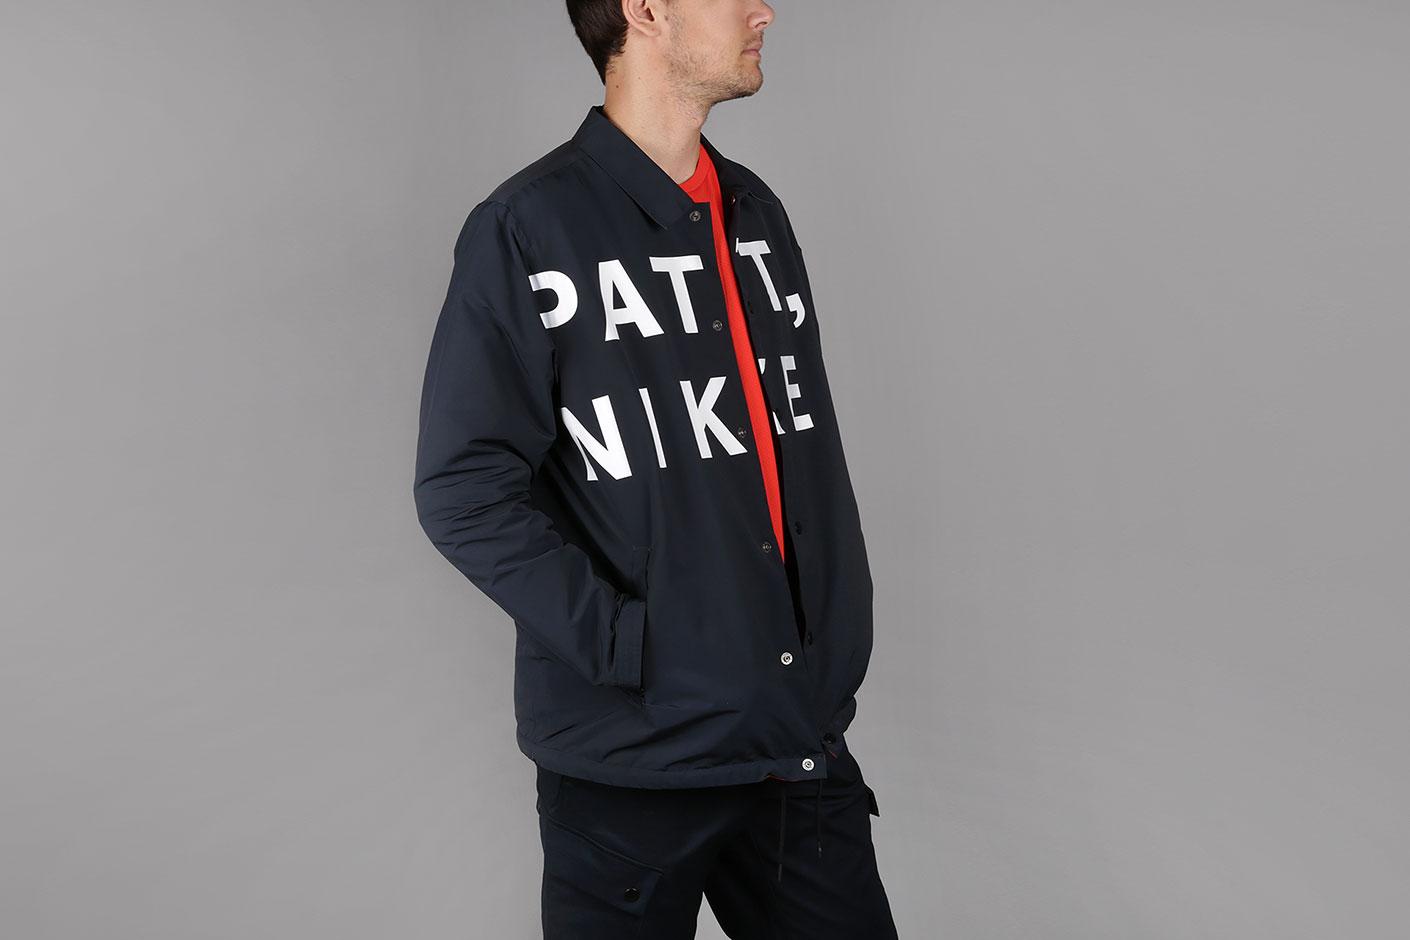 311324f9b05d Синяя мужская куртка Nike X Patta NRG Coach Jacket от Nike (AH6488 ...